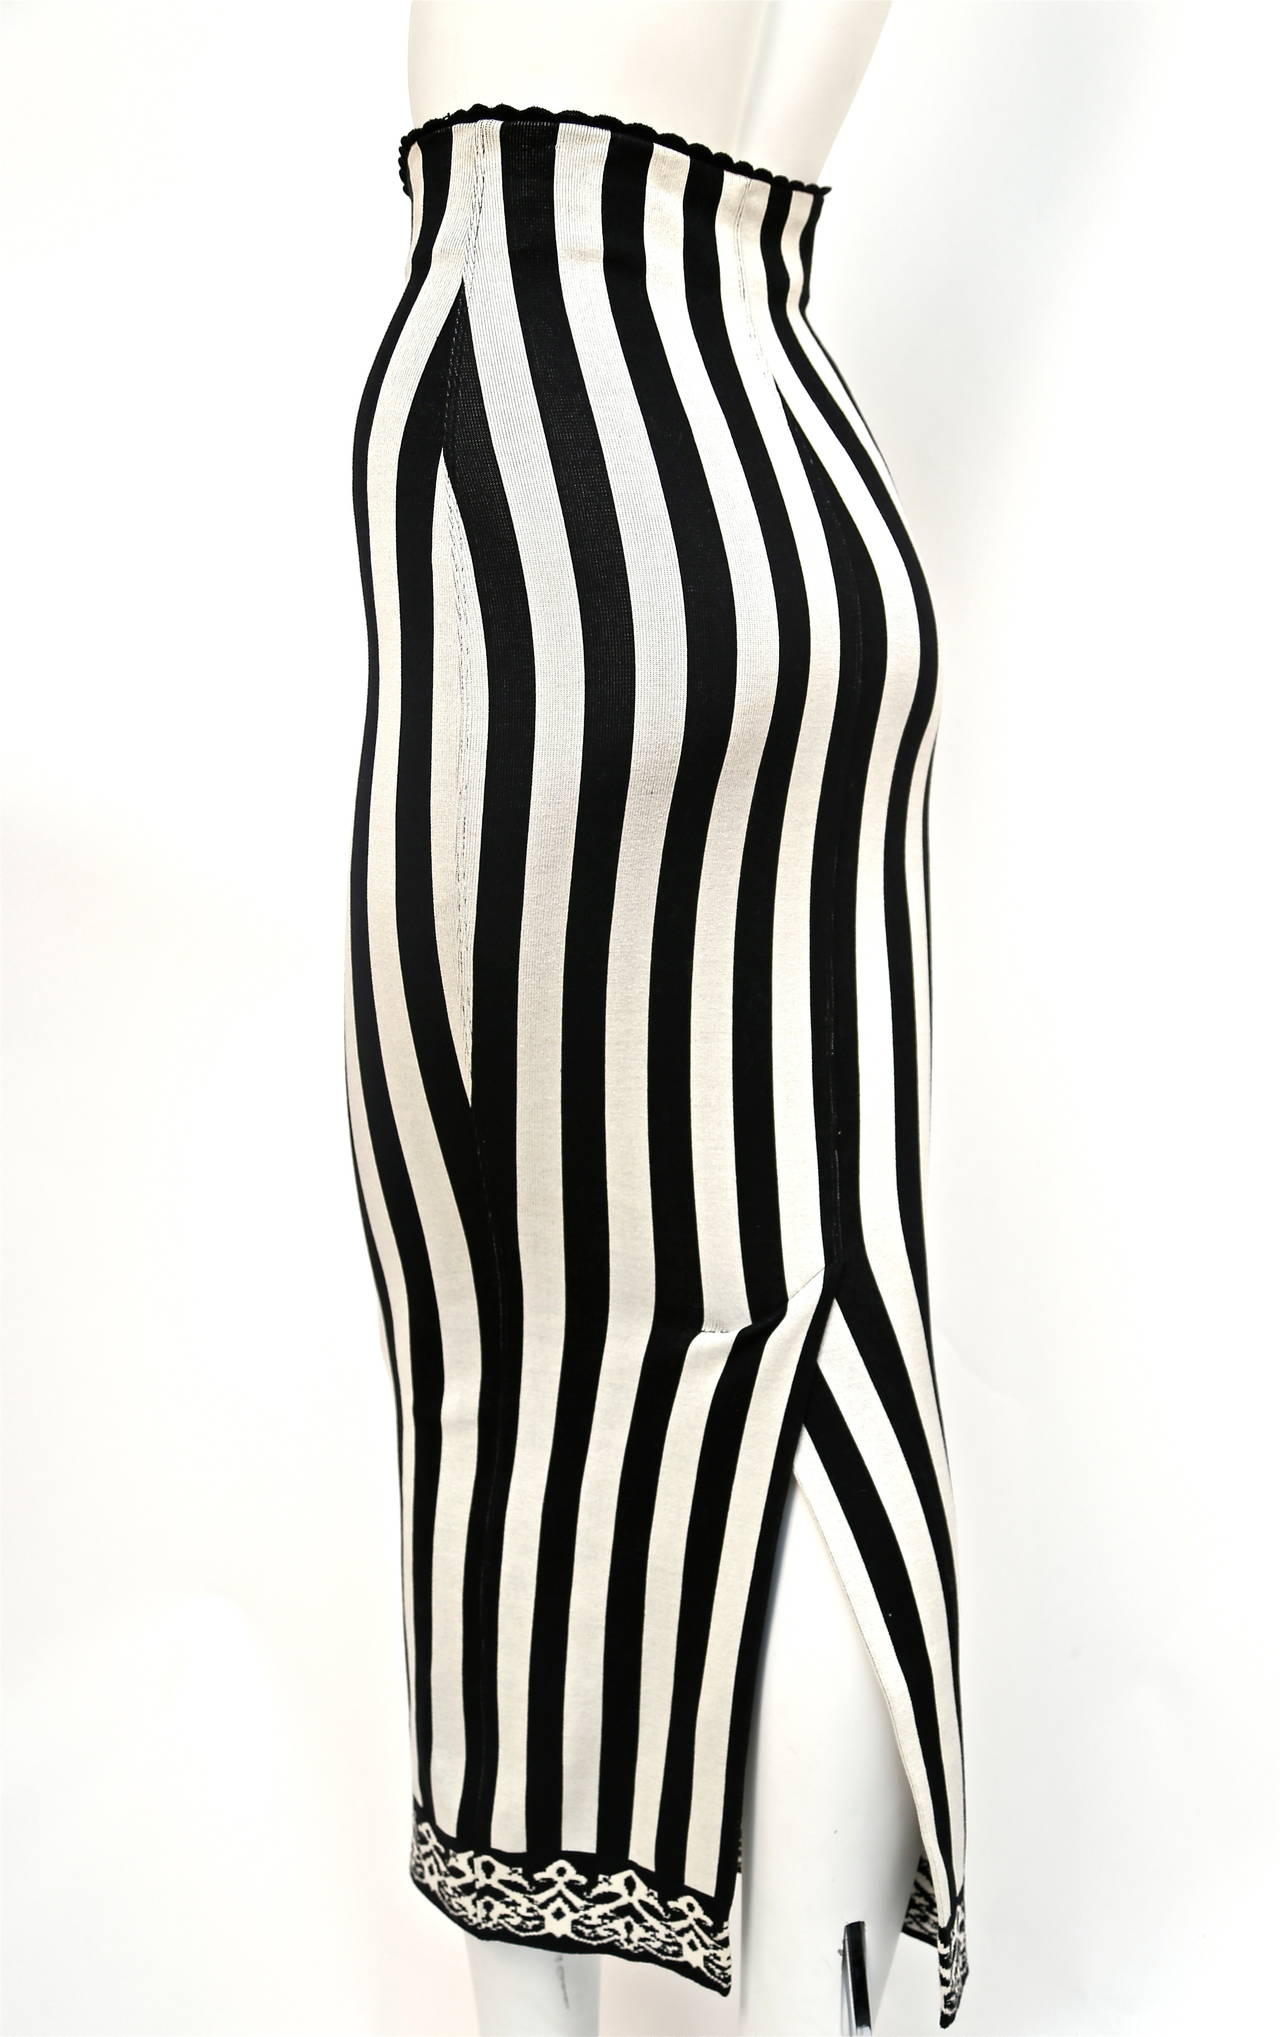 1992 AZZEDINE ALAIA black and white striped skirt 2